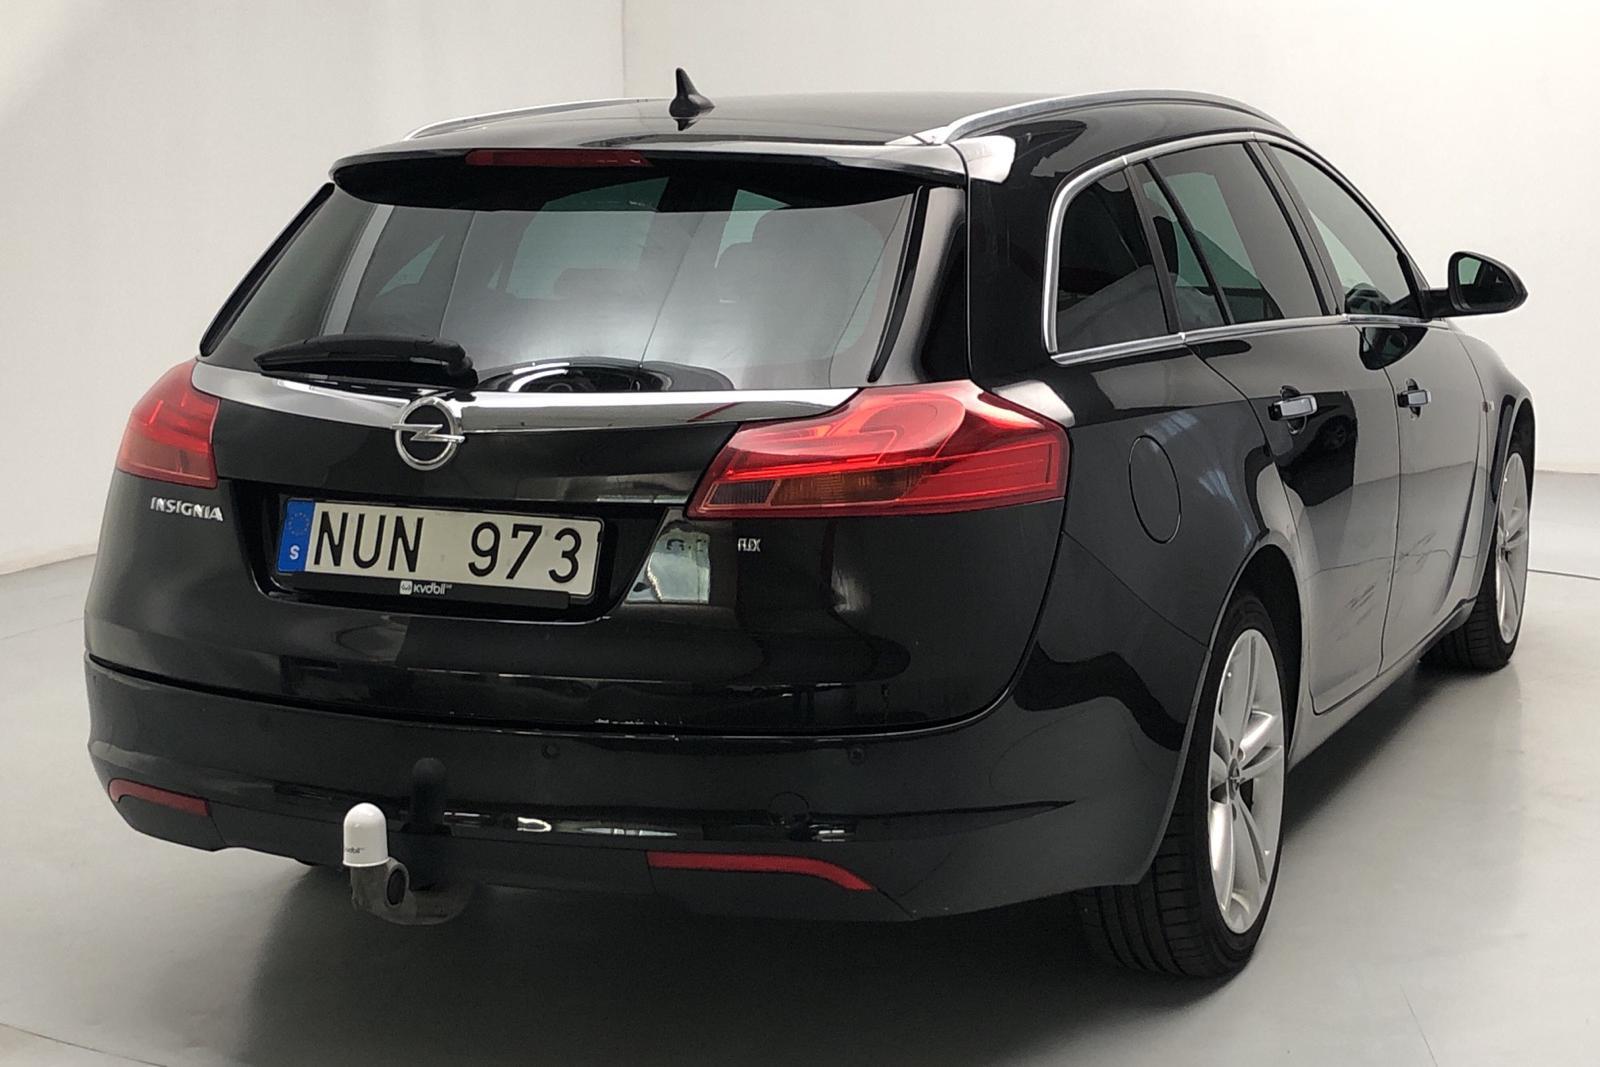 Opel Insignia 2.0 CDTI ecoFLEX Sports Tourer (160hk) - 140 000 km - Manual - black - 2012